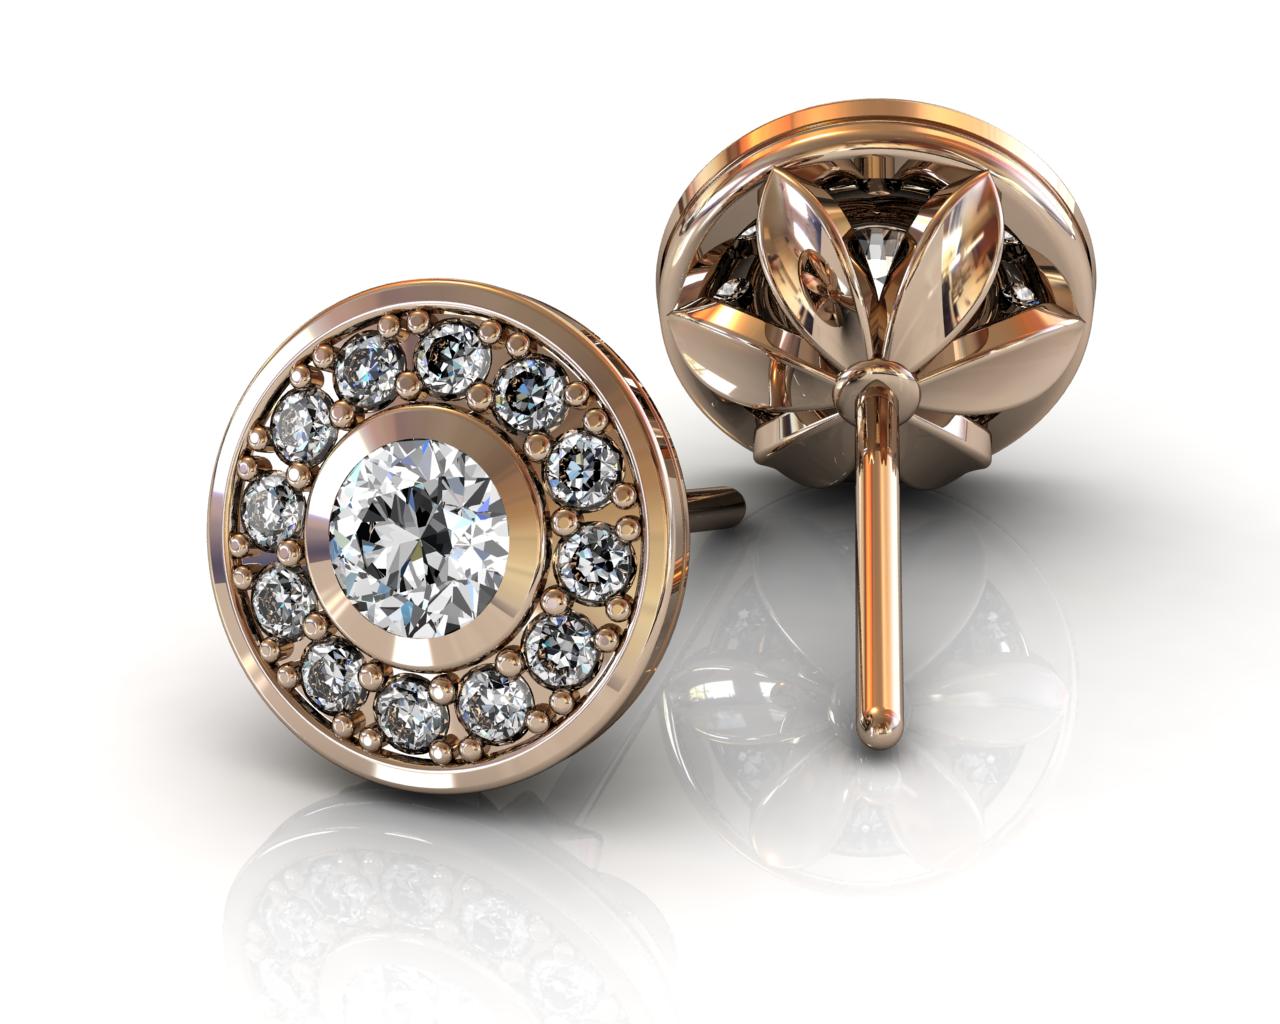 13 Diamond Halo Stud Earrings - Rose Gold